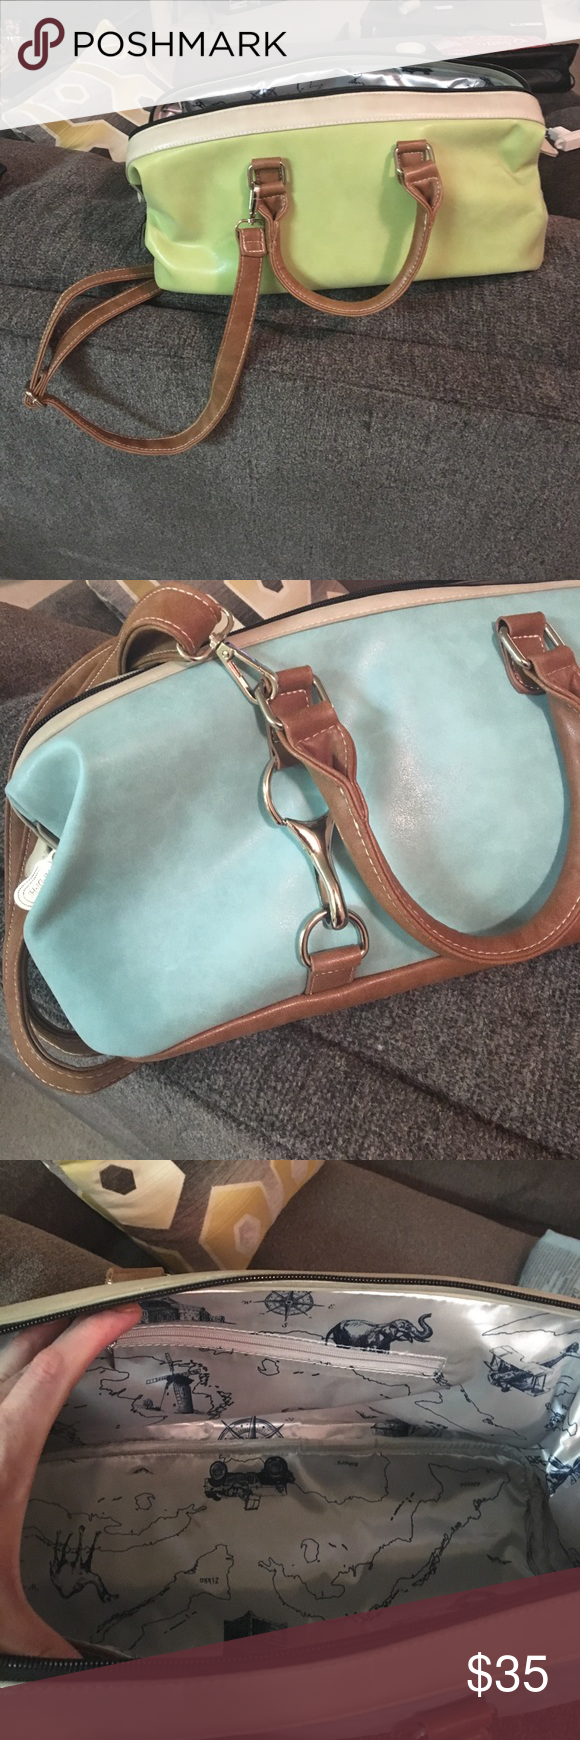 HI DI HI Vikken bag NWOT vikken bag in expedition south bag adorable for freelance artists hi di hi Bags